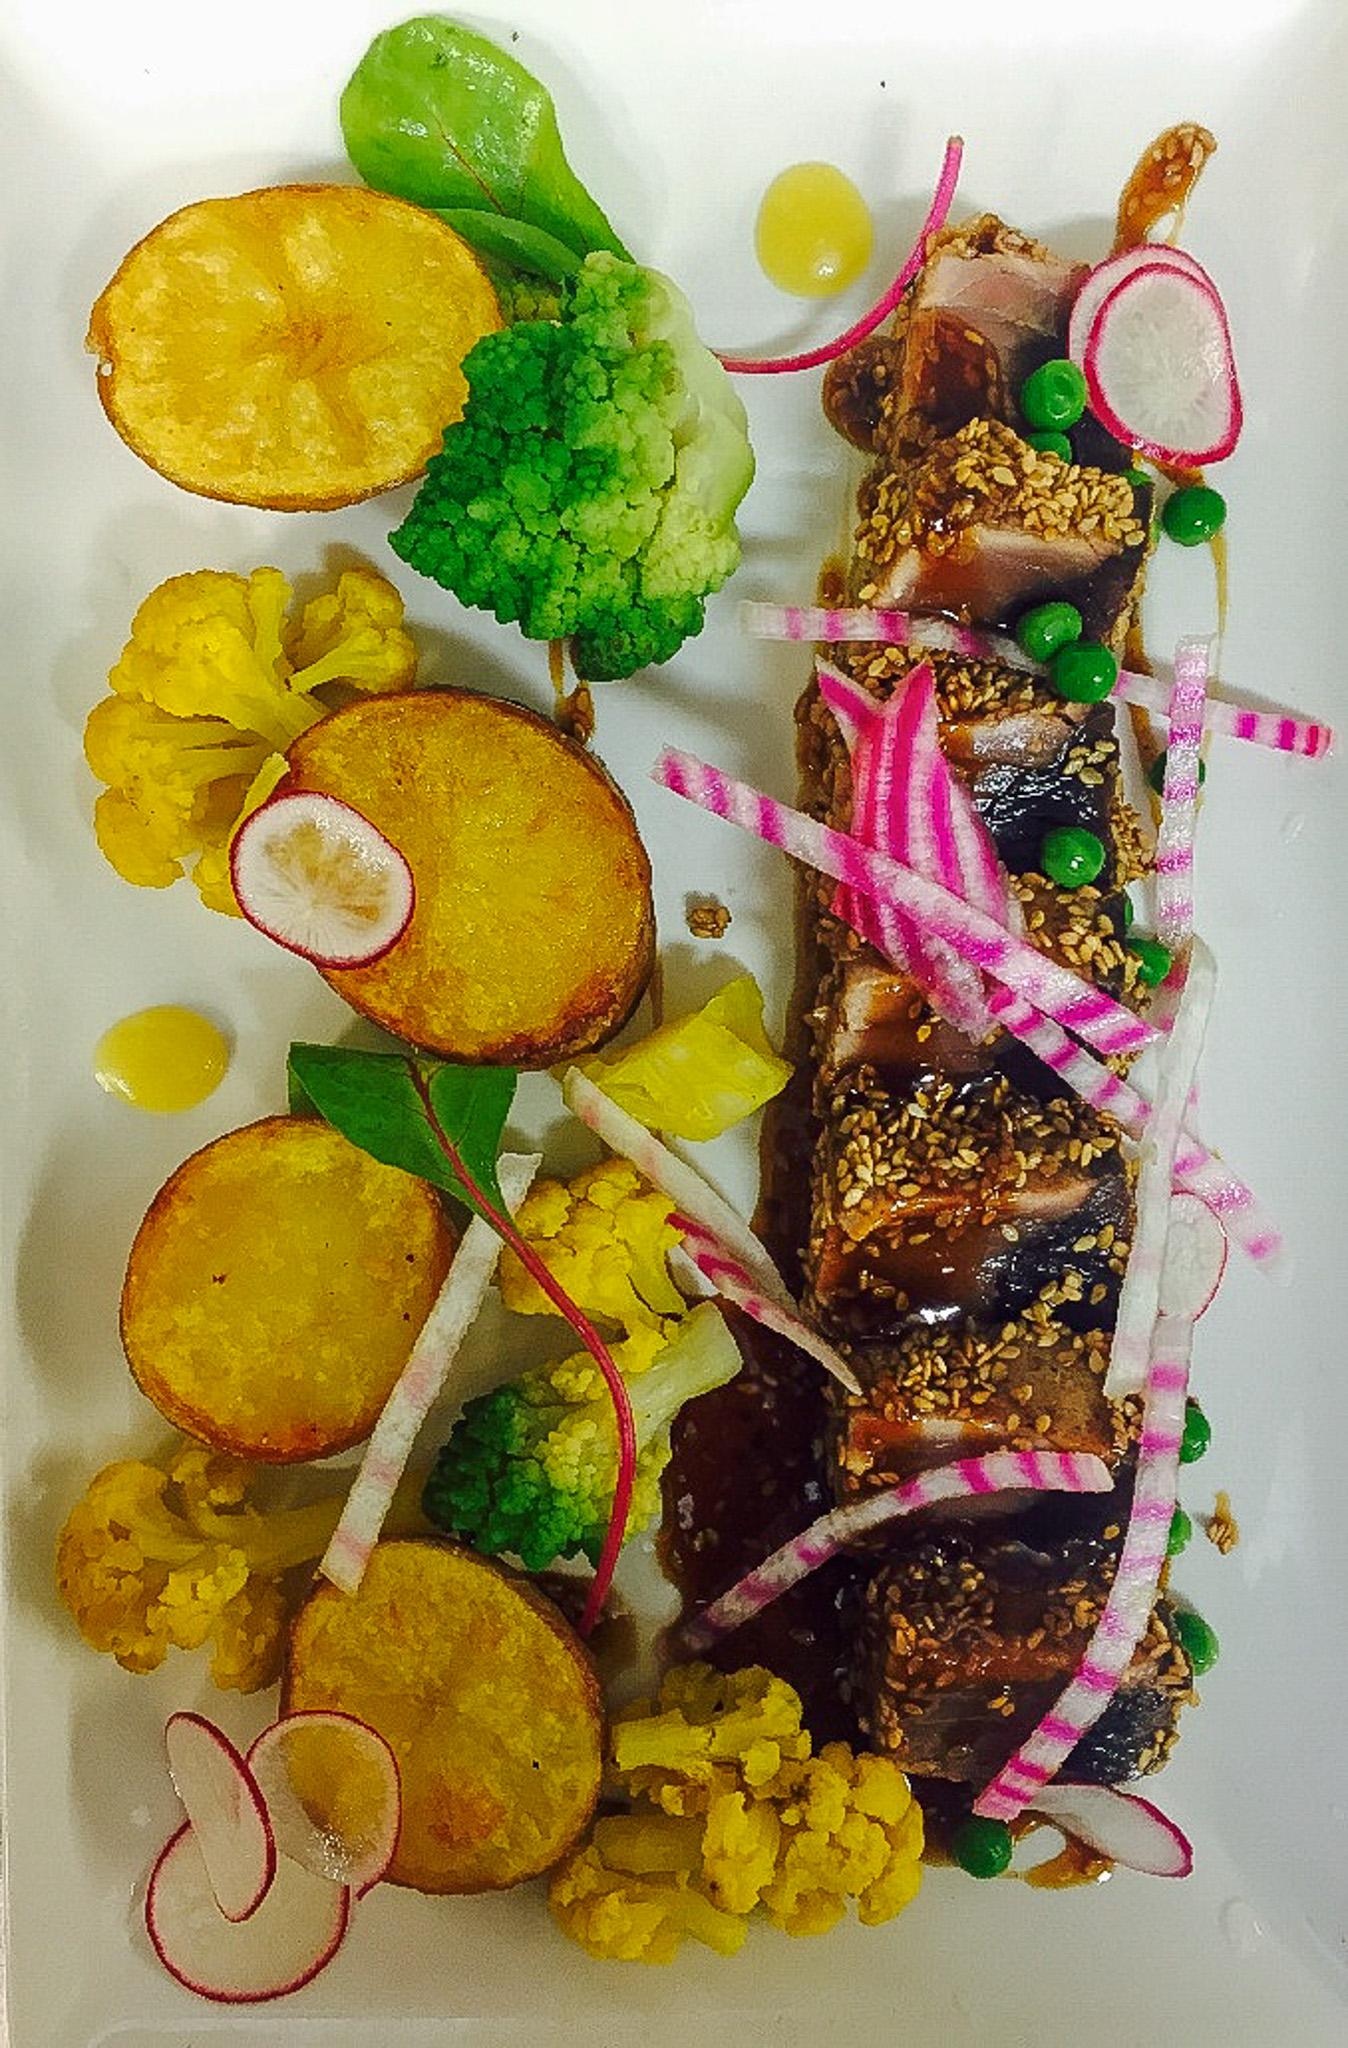 17062019-Are y sem-restaurant-argeles sur mer- 10